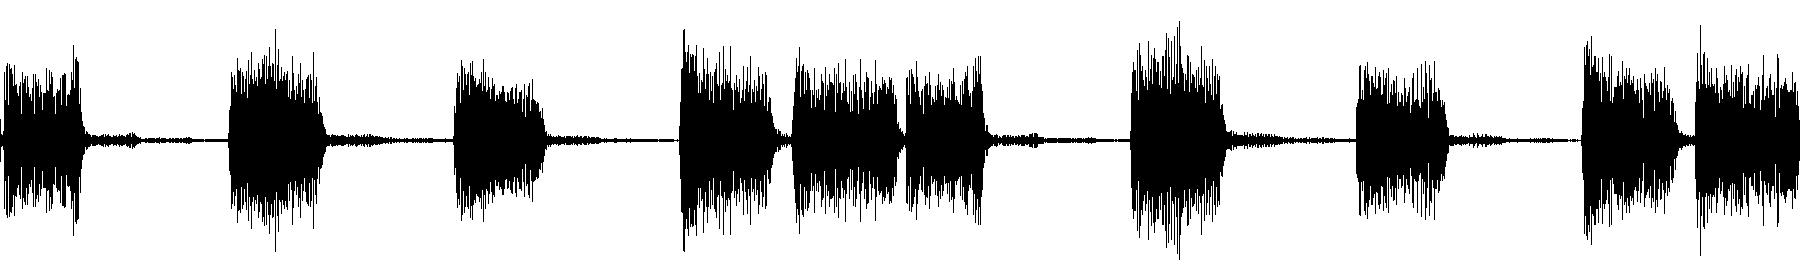 Fhp ssdisco 20chords 115 c